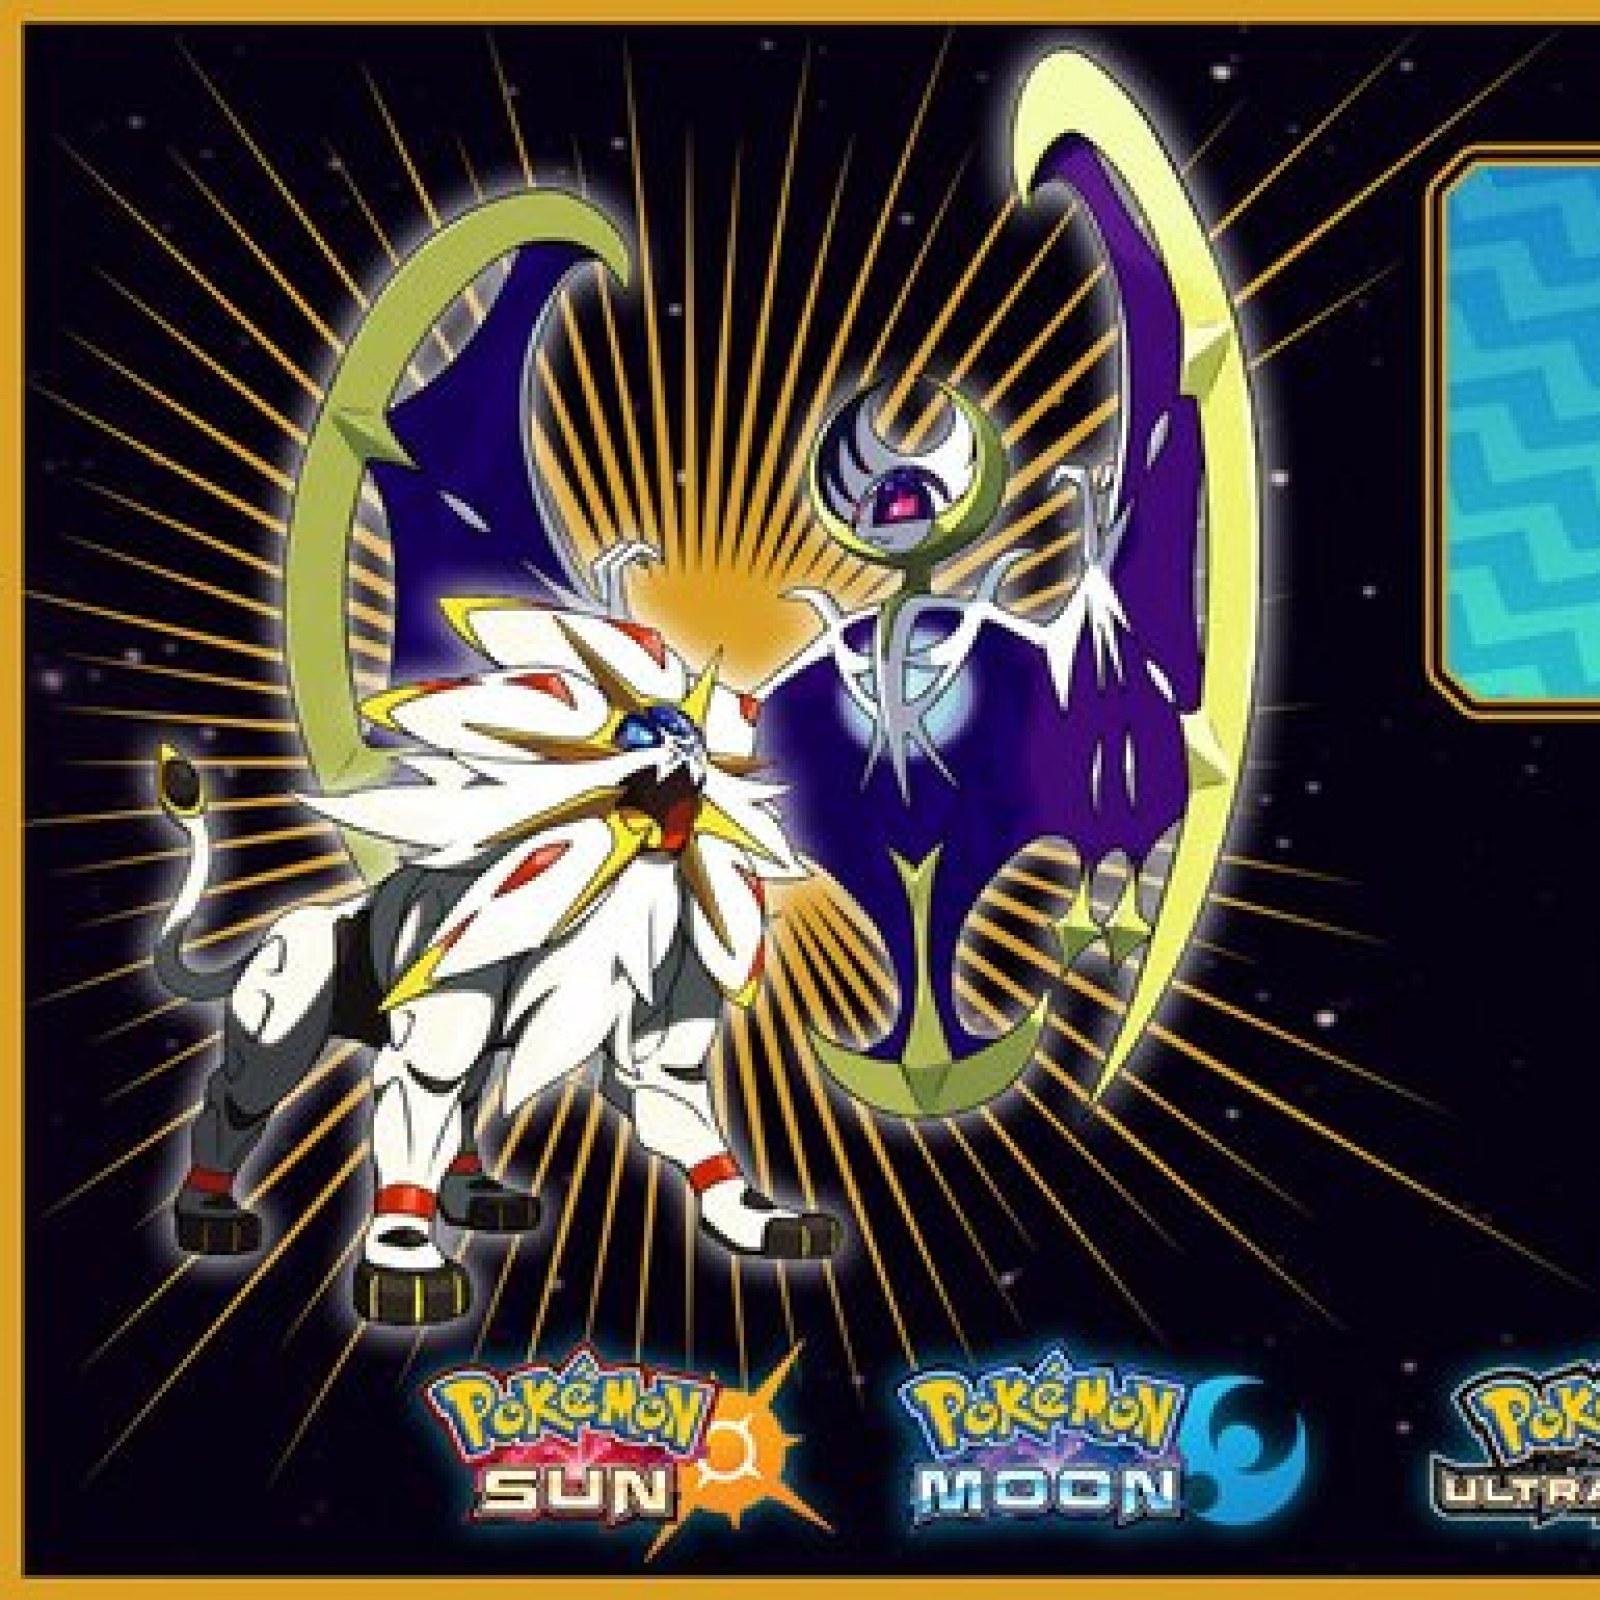 Pokémon Ultra Sun and Moon': Shiny Solgaleo and Lunala to be